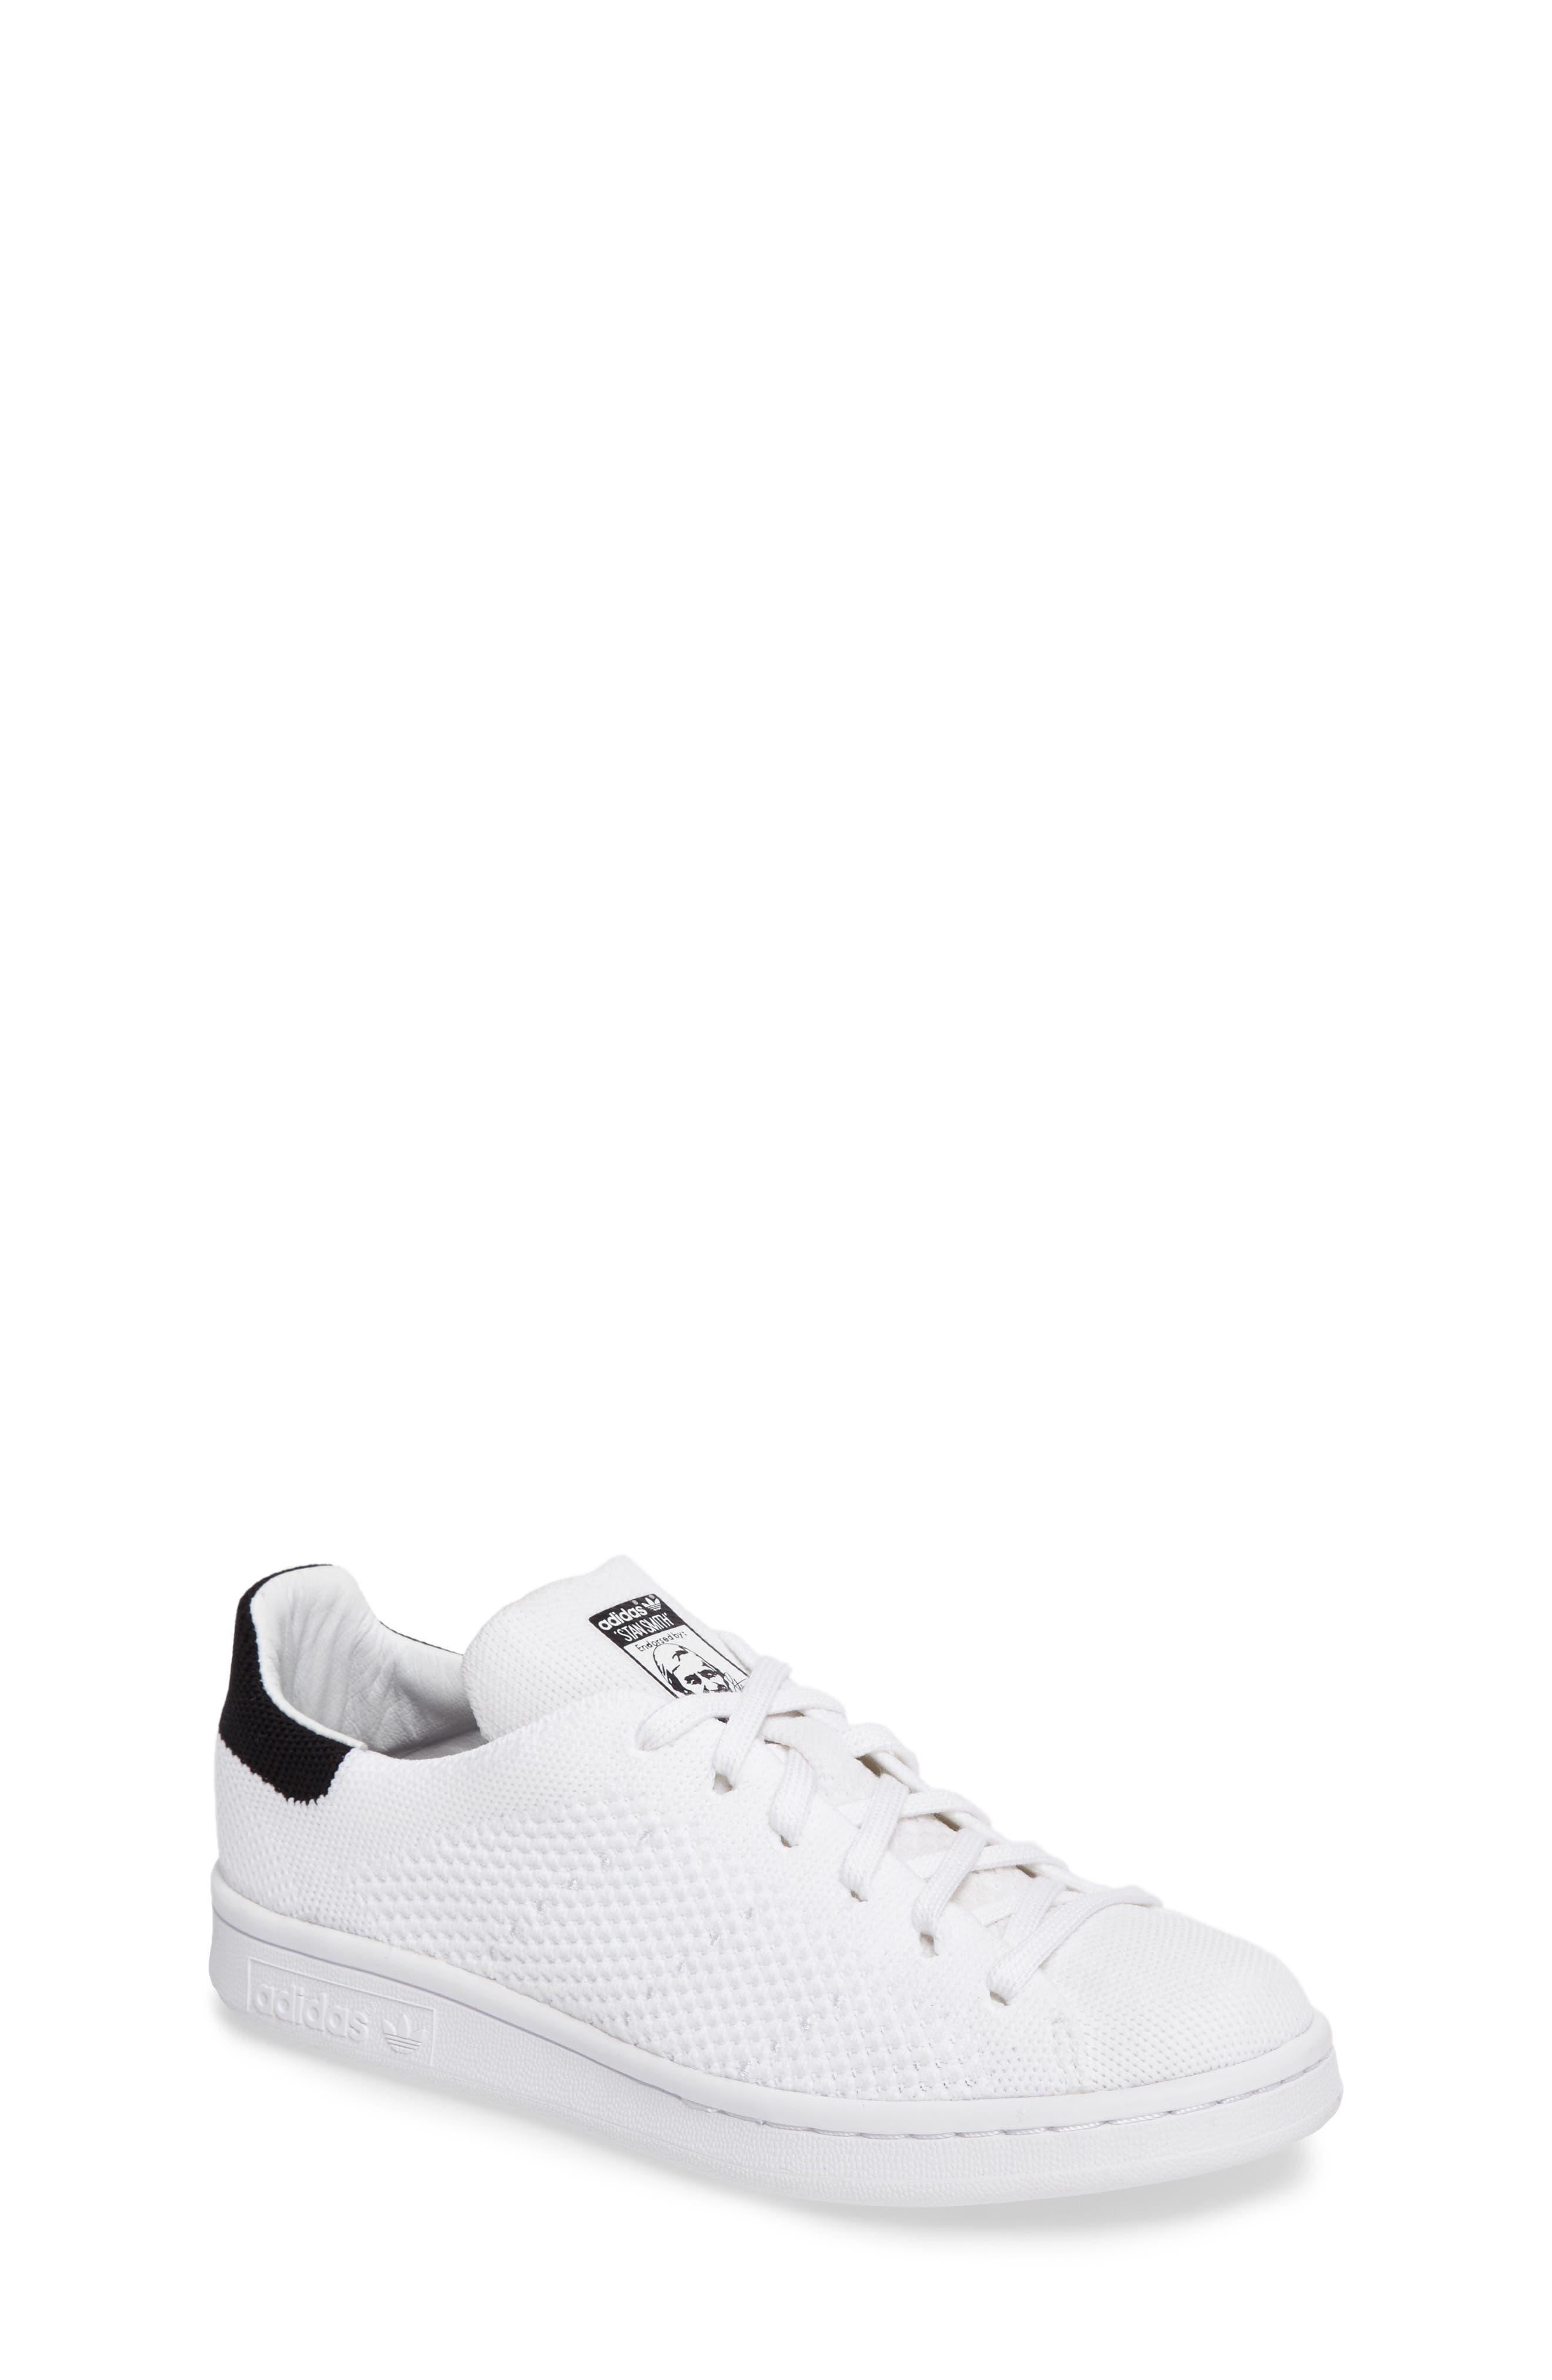 Stan Smith Primeknit Sneaker,                         Main,                         color, 100